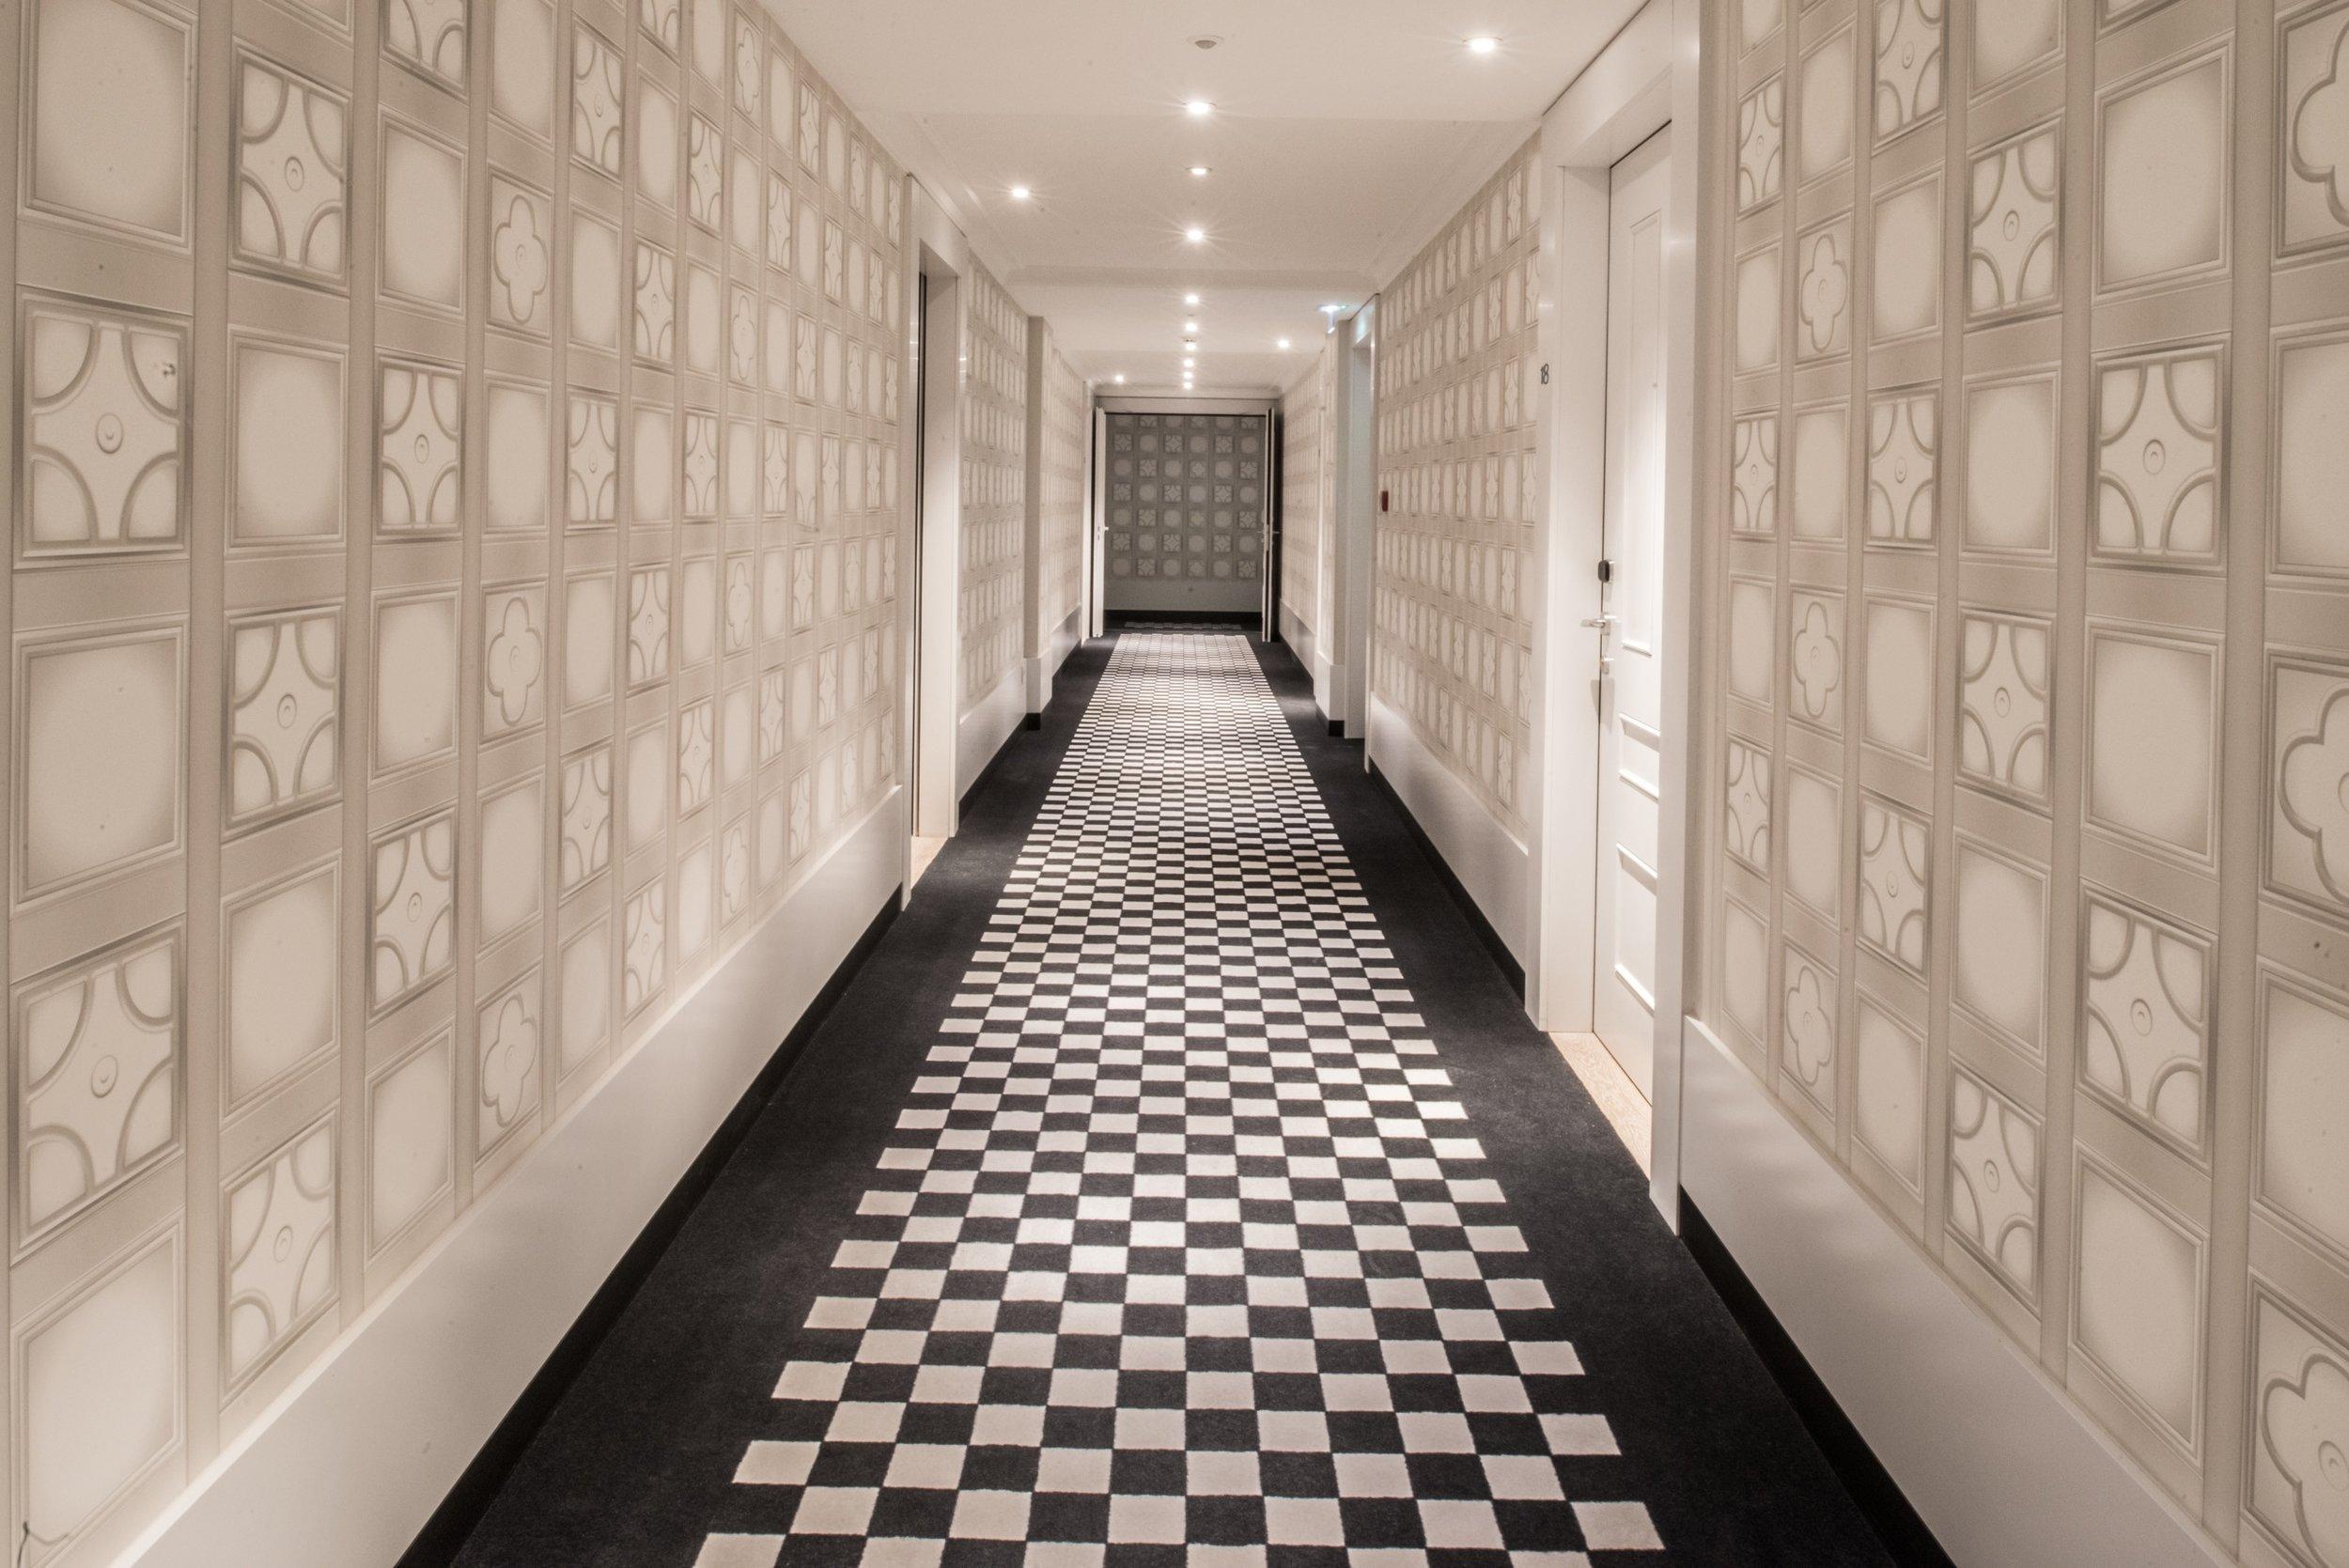 6_HotelMB201384- PTournairebdf.jpg